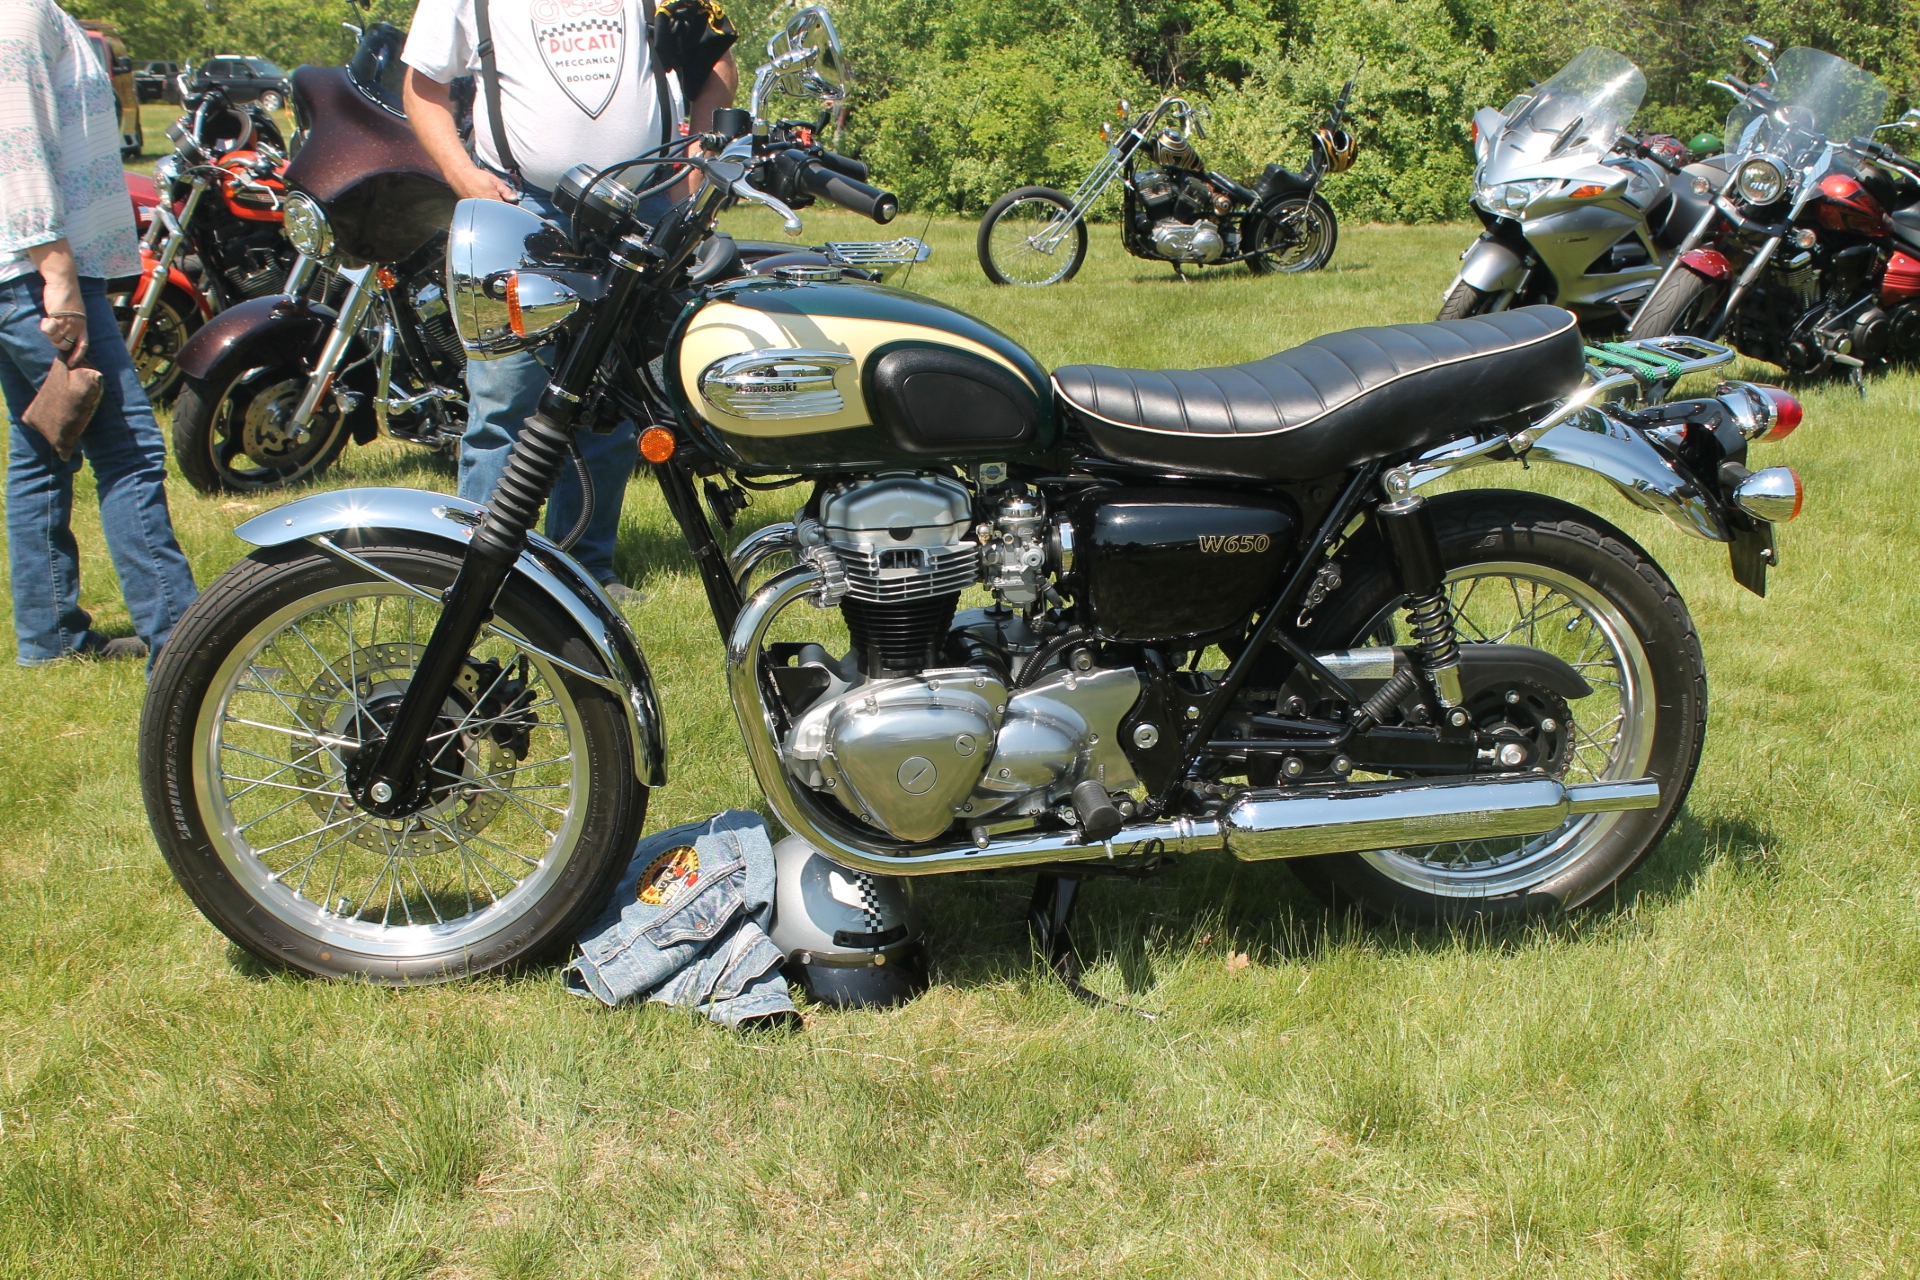 An English Style Kawasaki W650 Sighted